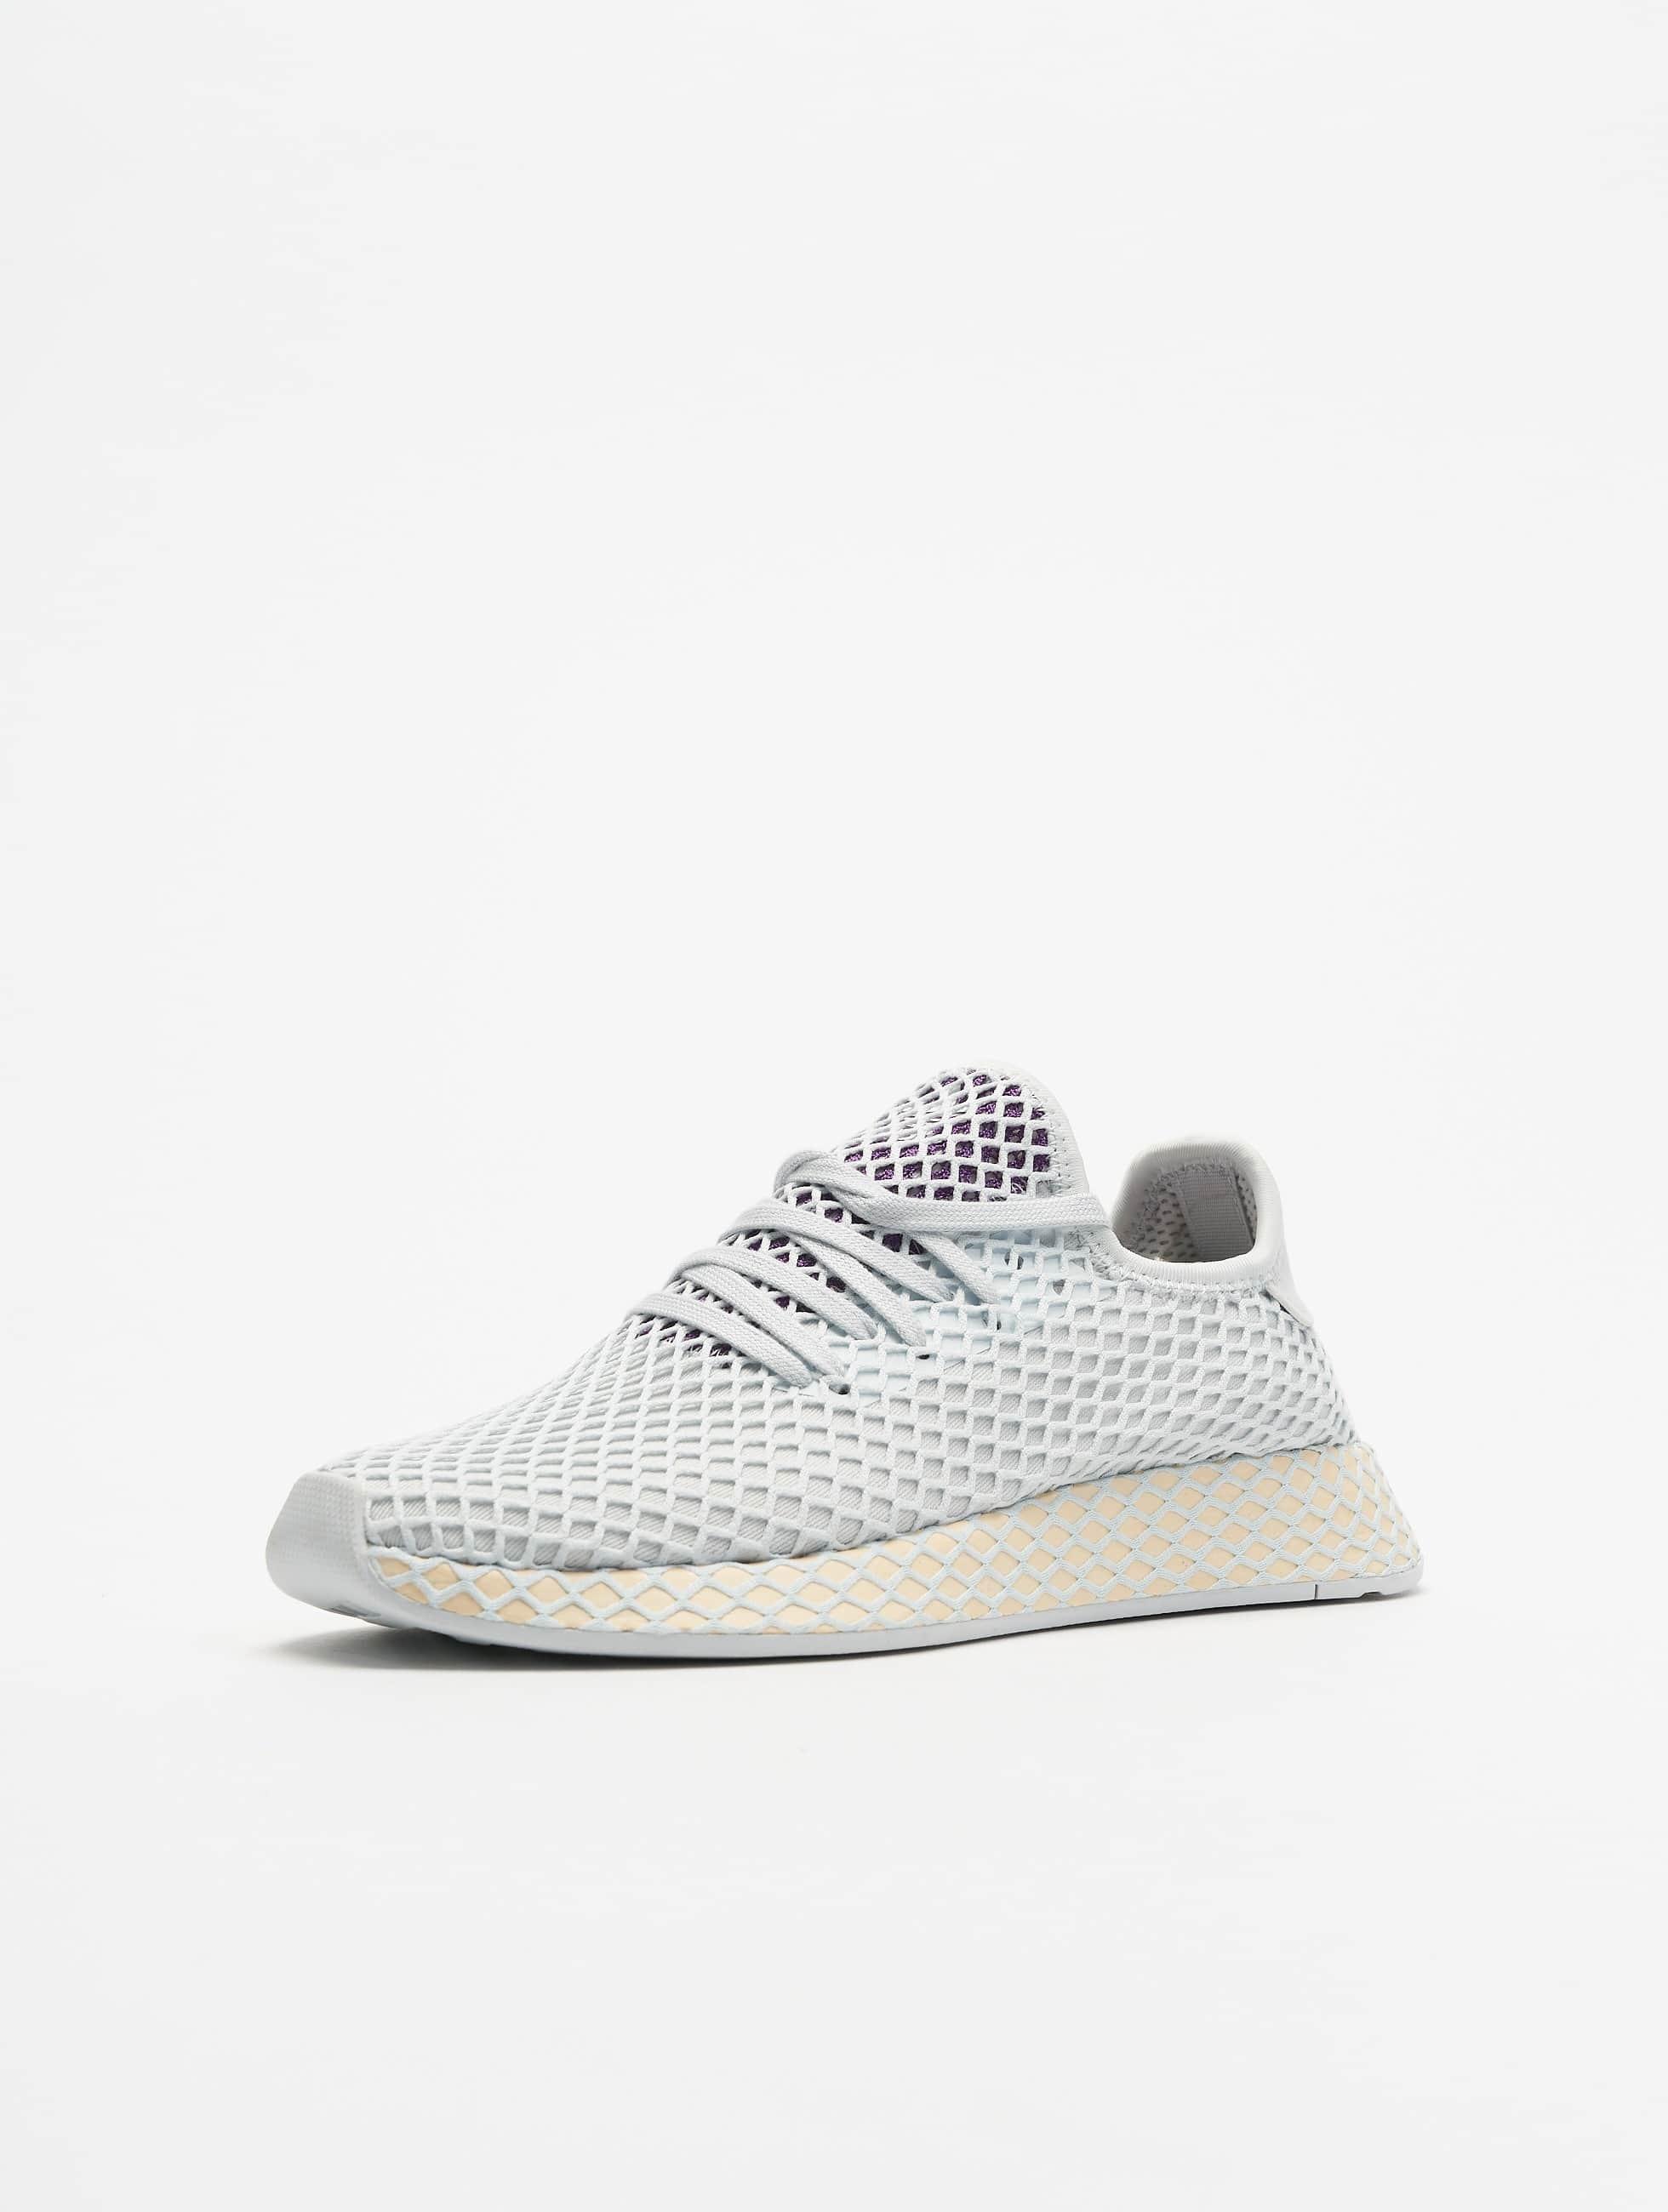 Runner Deerupt Adidas W Chaussures Originals Femme Baskets Ifw4qgXB4